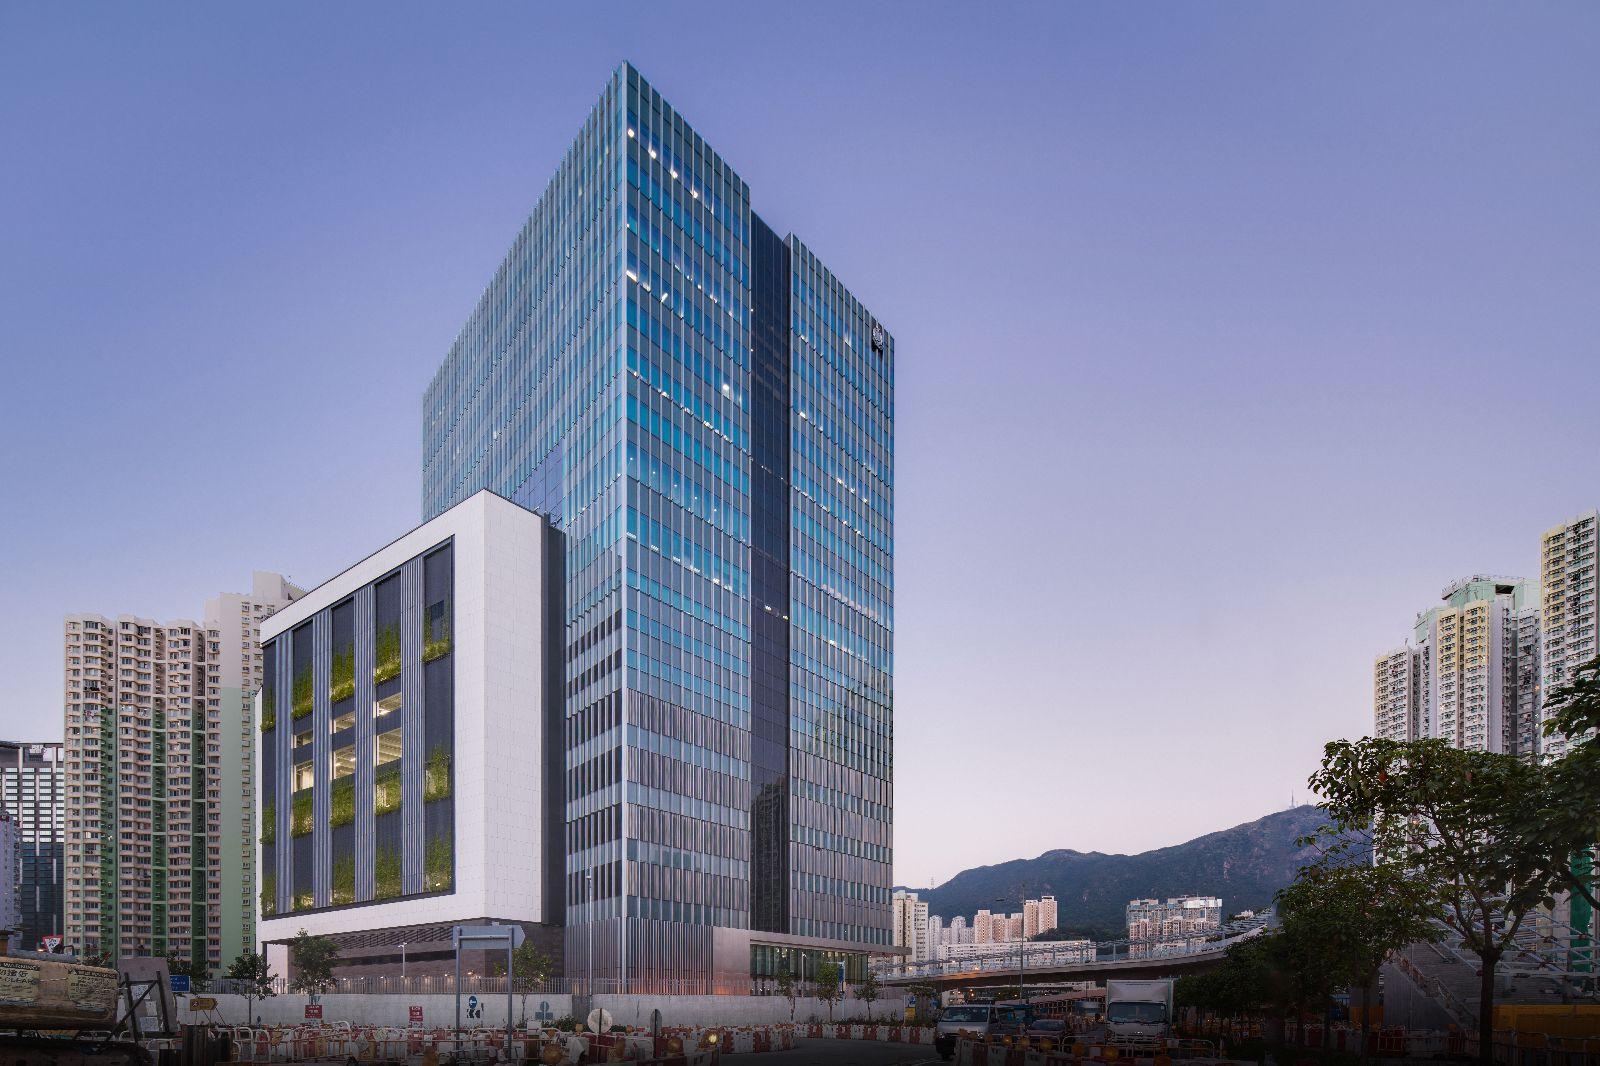 Kowloon East